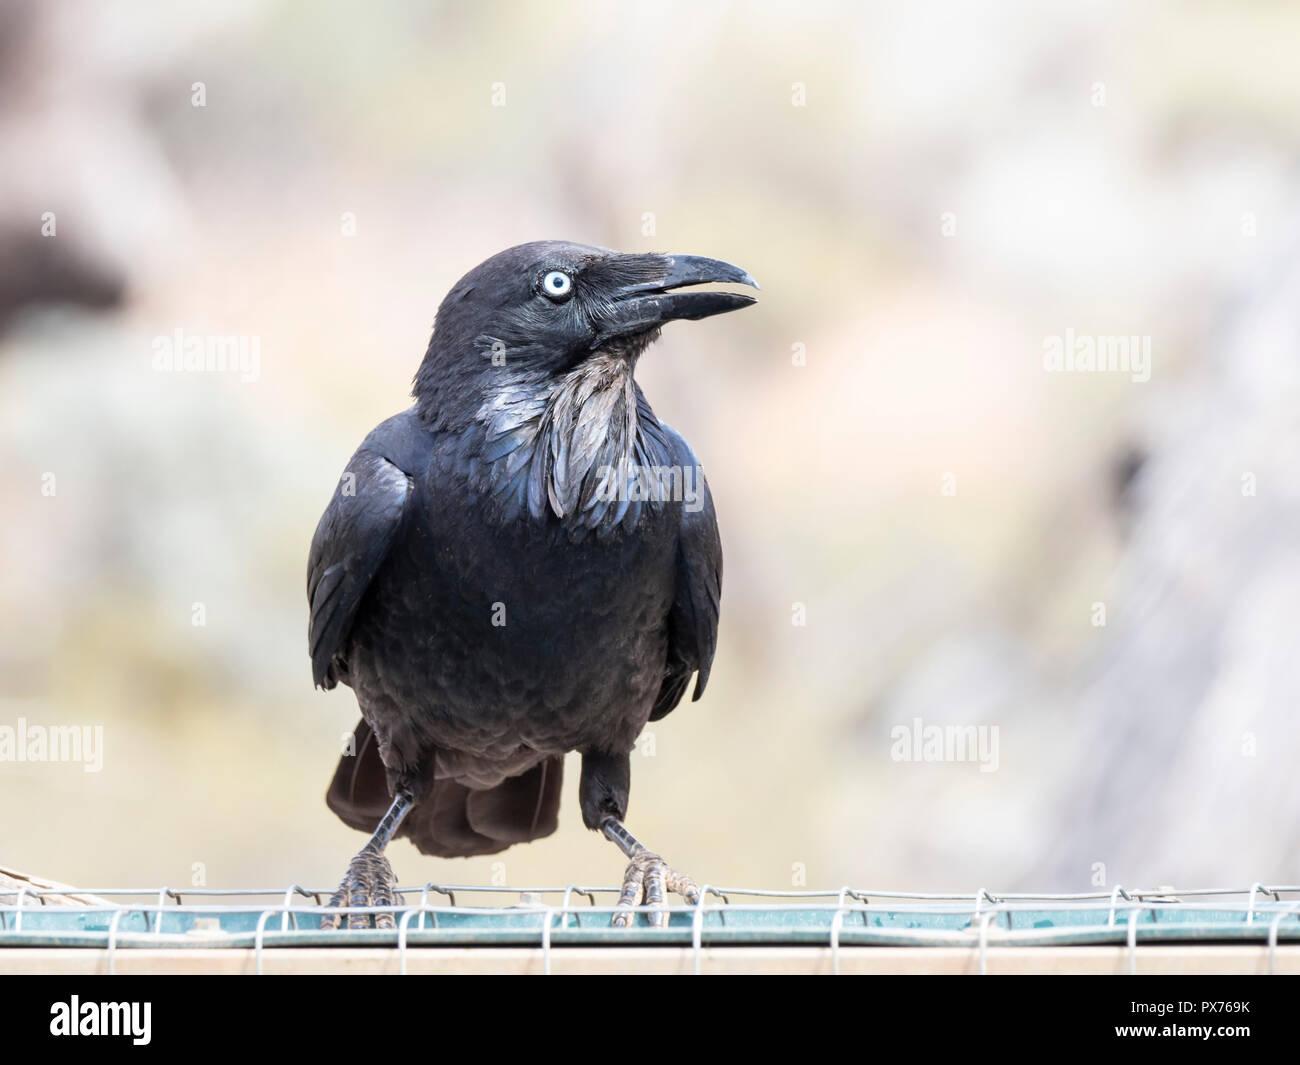 Australian Raven (Corvus coronoides) race 'coronoides' - Stock Image